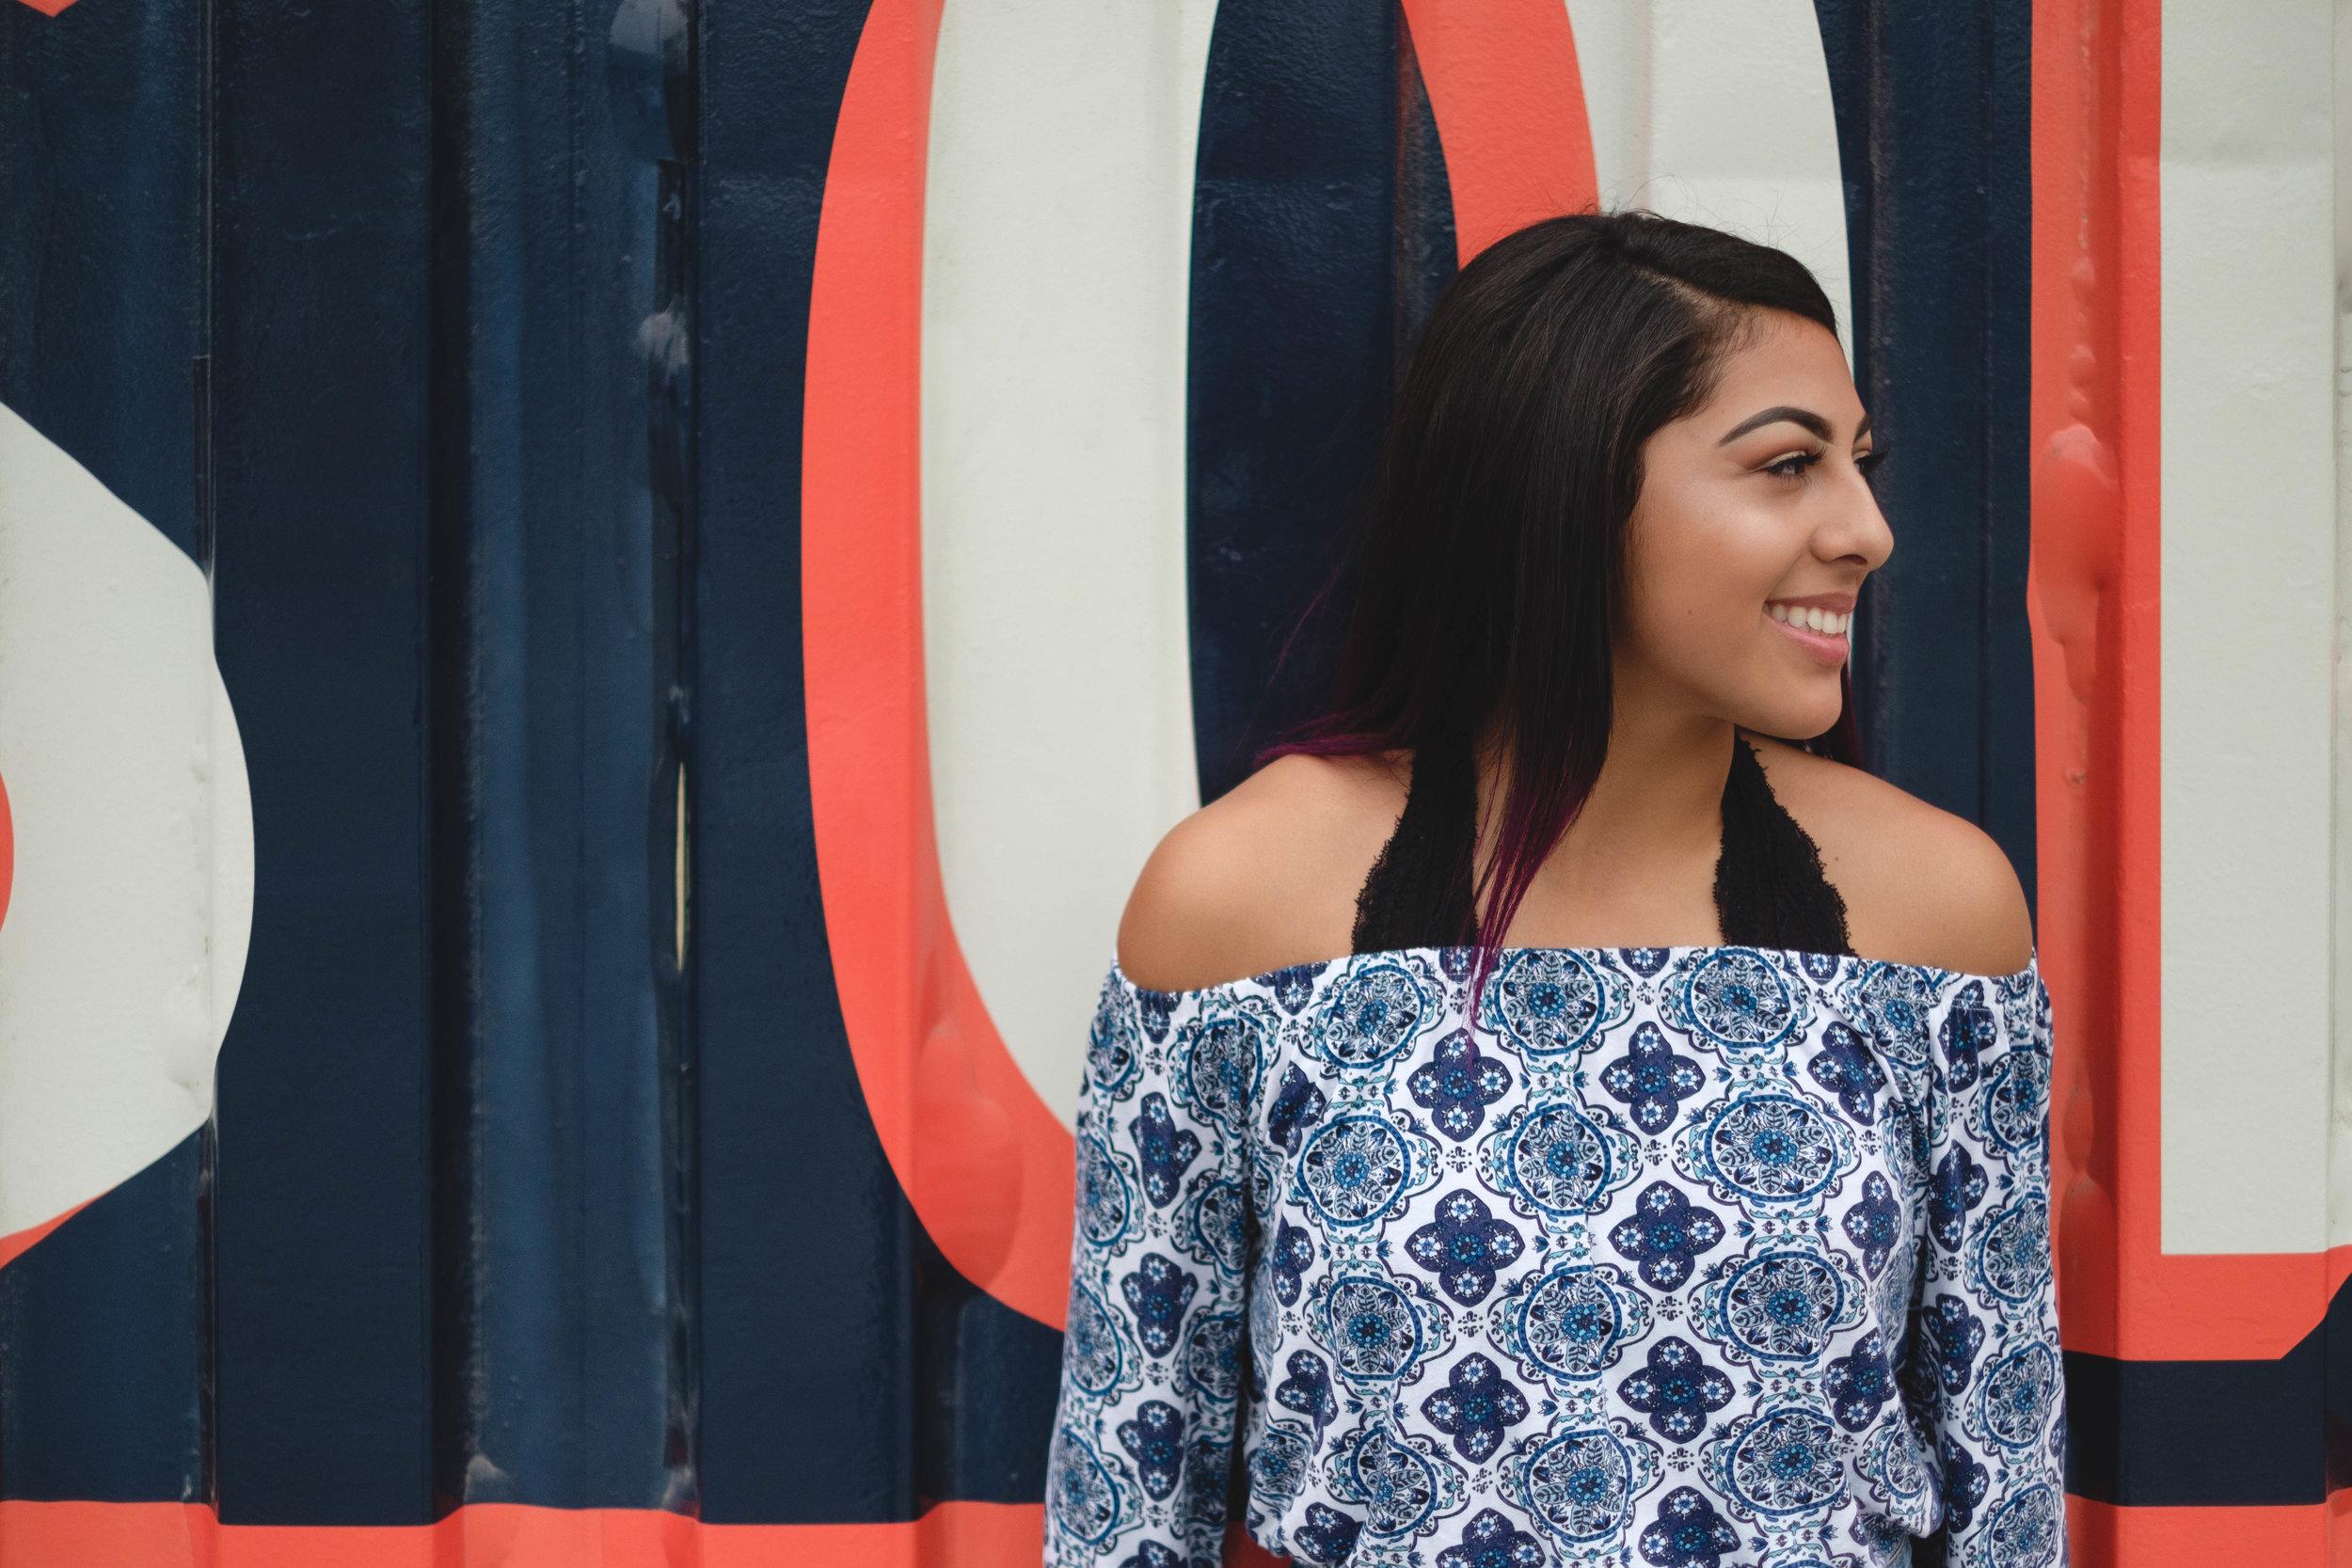 Portraits in Huntington Beach